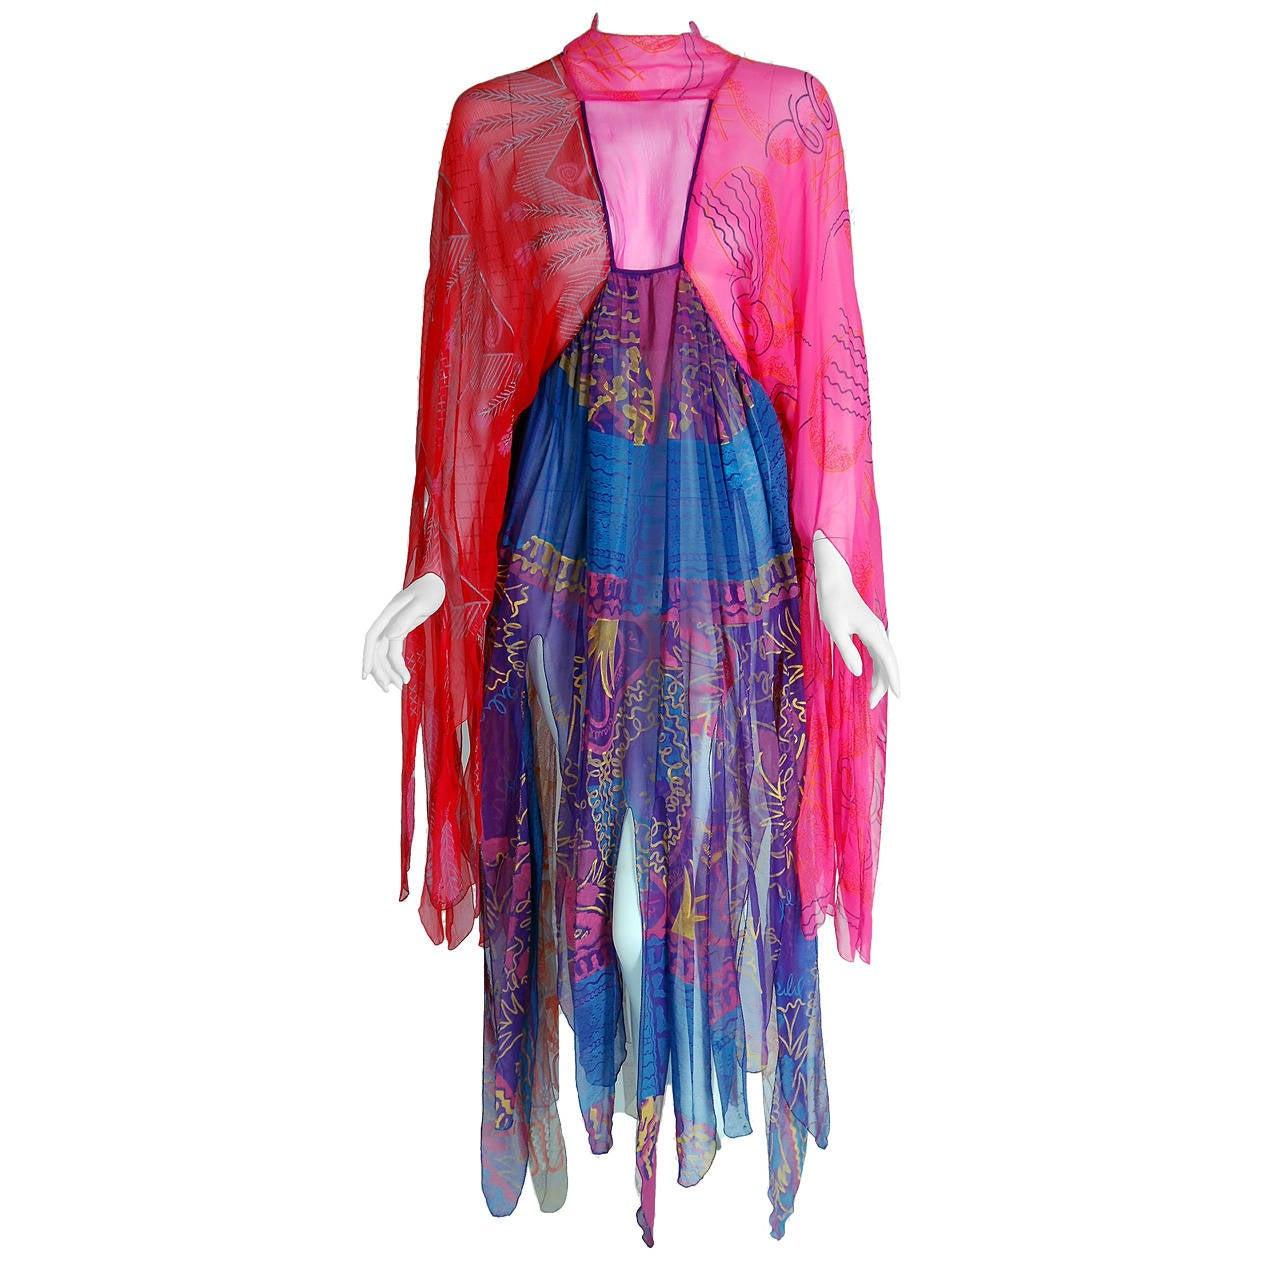 1972 Zandra Rhodes Hand-Painted Indian Feathers & Lillies Silk Caftan Dress 1